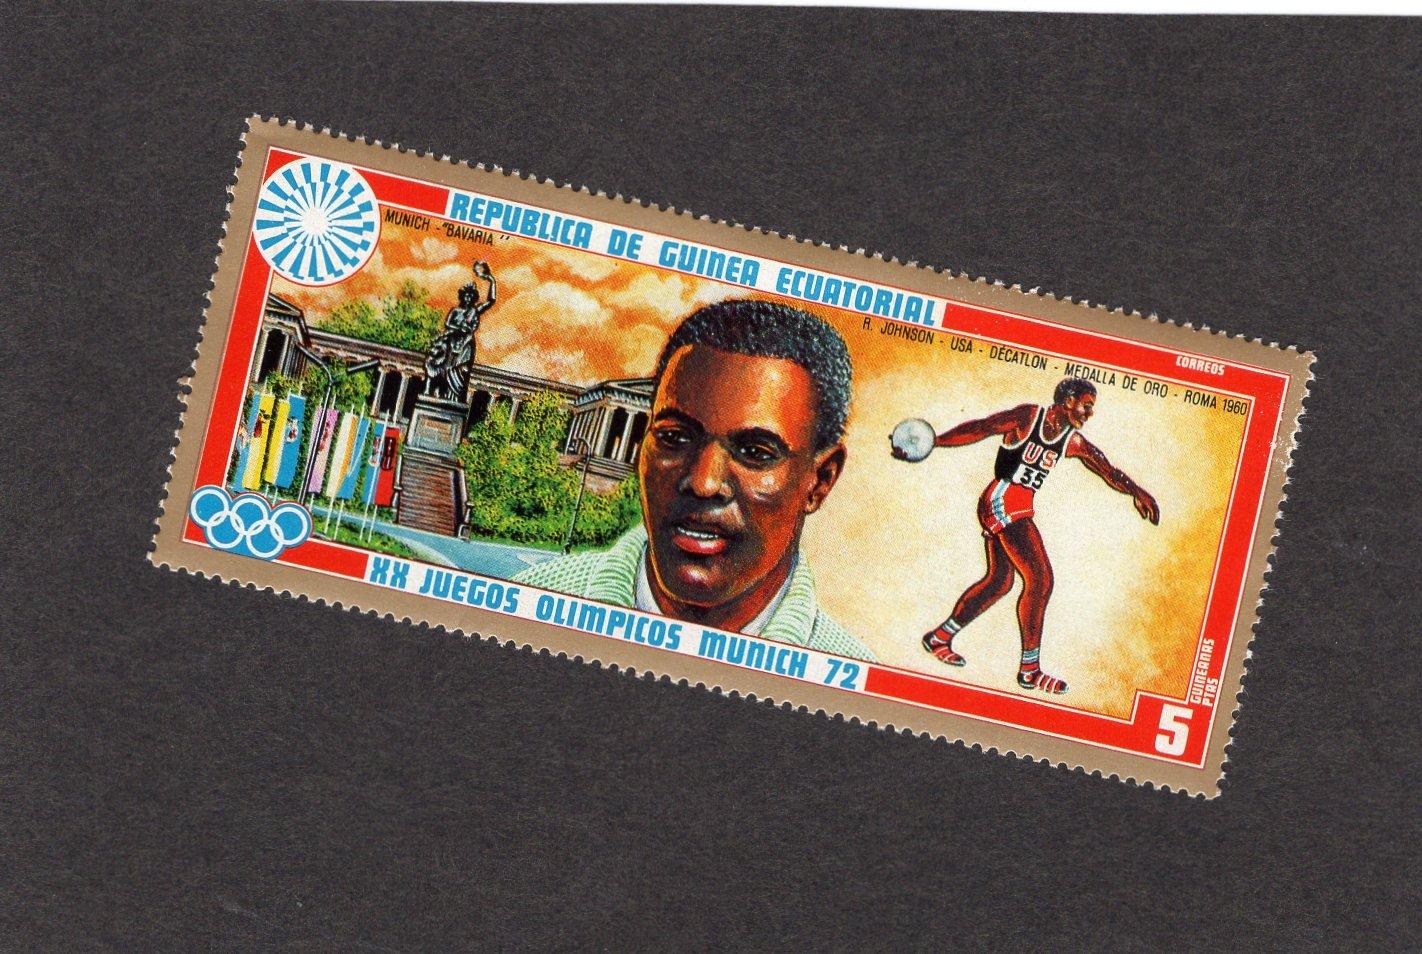 Discus Thrower, Postage Stamp, Equatorial de Guinea, Decathlon, Munich Olympics